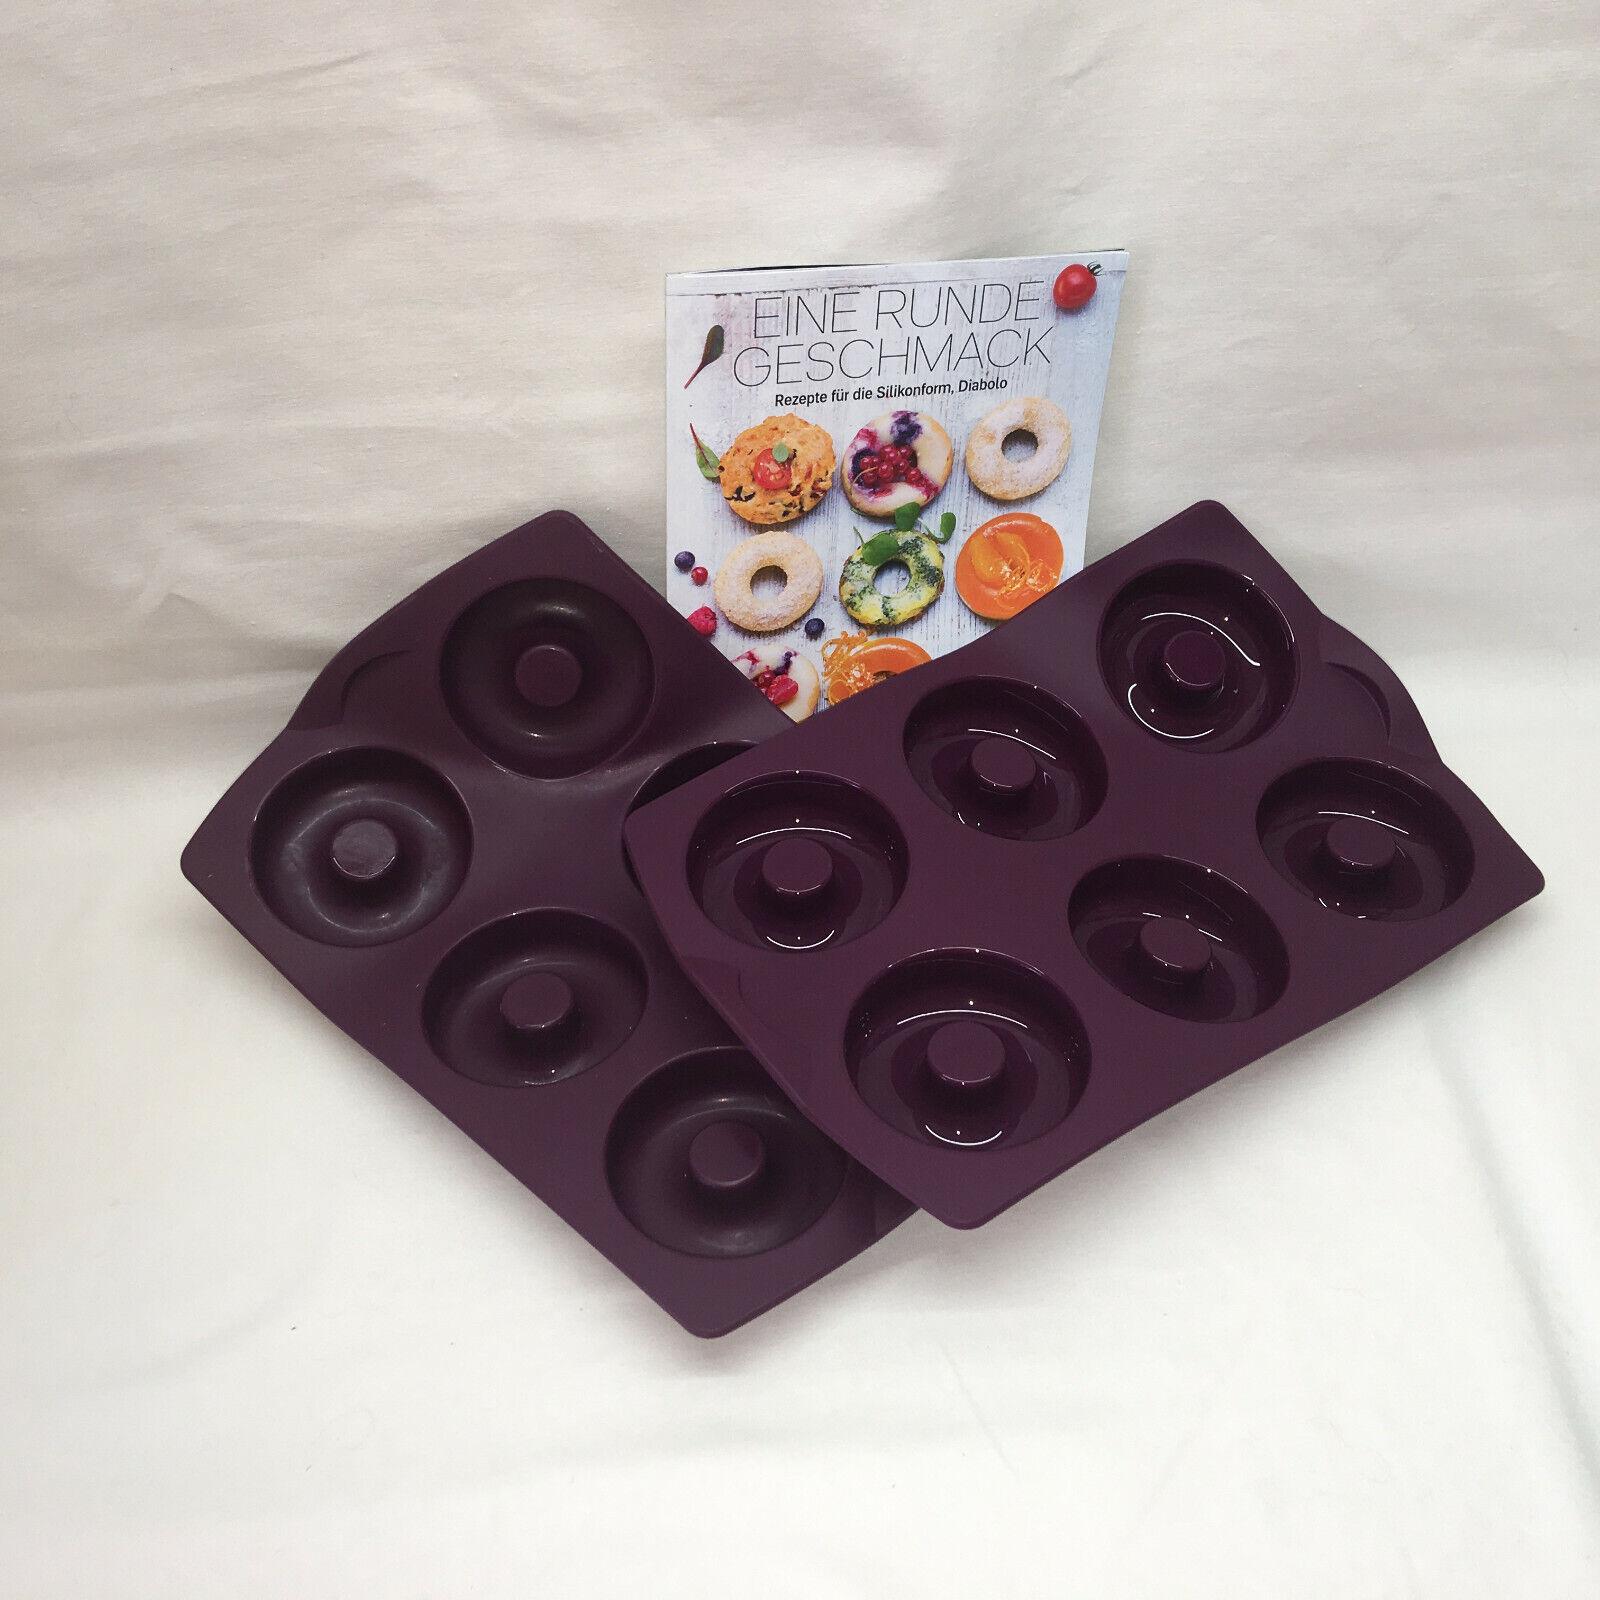 TUPPERWARE - 3er-set - 2 x Diabolo-Donut-Silicone moule-rezeptheft-h49